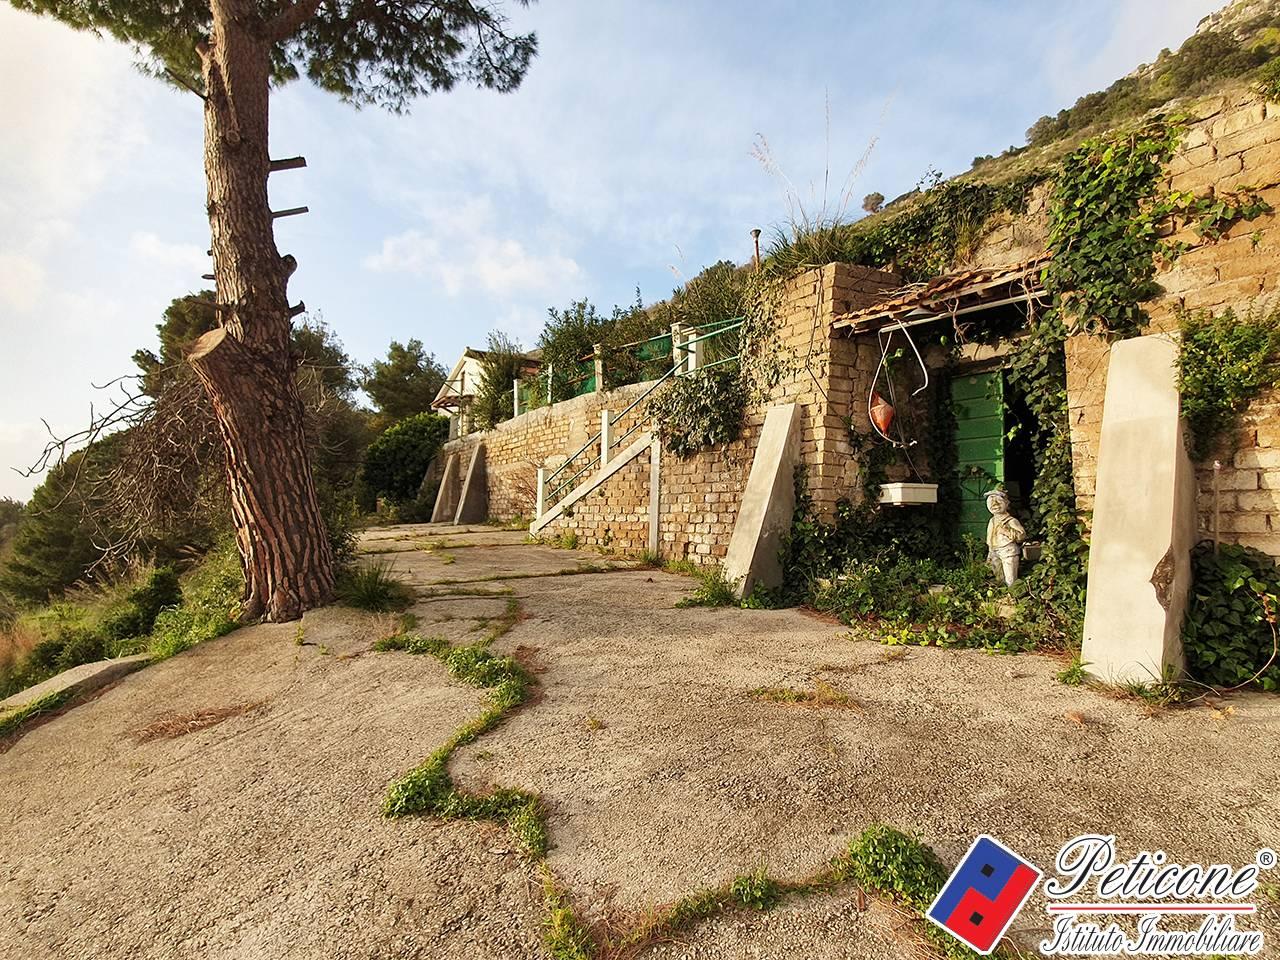 Villa in Vendita a Sperlonga: 3 locali, 50 mq - Foto 1